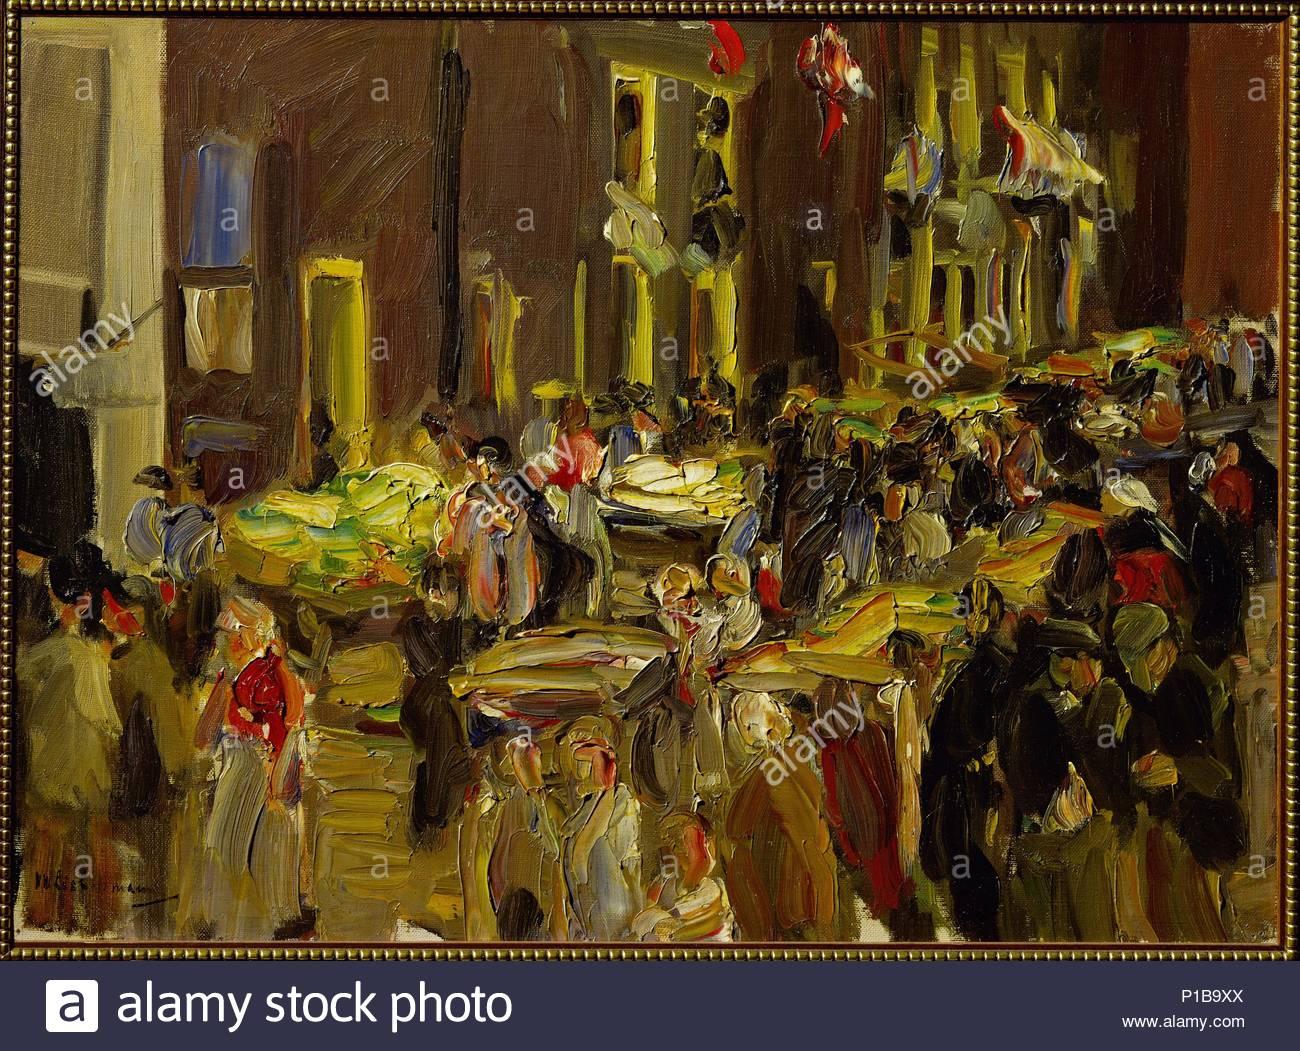 Jodenbreestraat (Jews' street) in Amsterdam, 1905 Canvas, 40 x 55 cm Inv. 353 / 1952. Author: Max Liebermann (1847-1935). Location: Kaiser-Wilhelm-Museum, Krefeld, Germany. - Stock Image